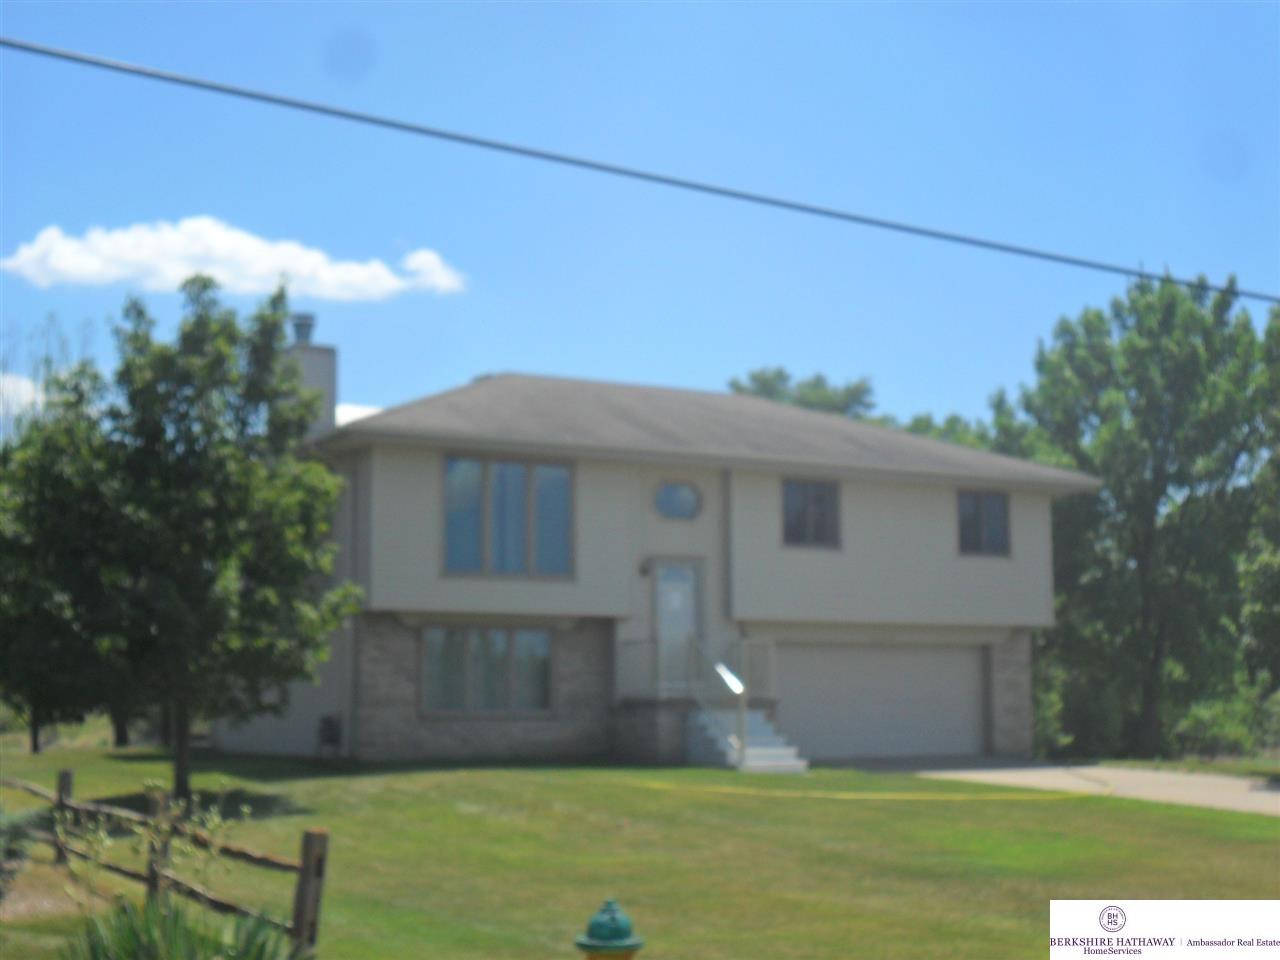 Real Estate for Sale, ListingId: 31004087, Plattsmouth,NE68048